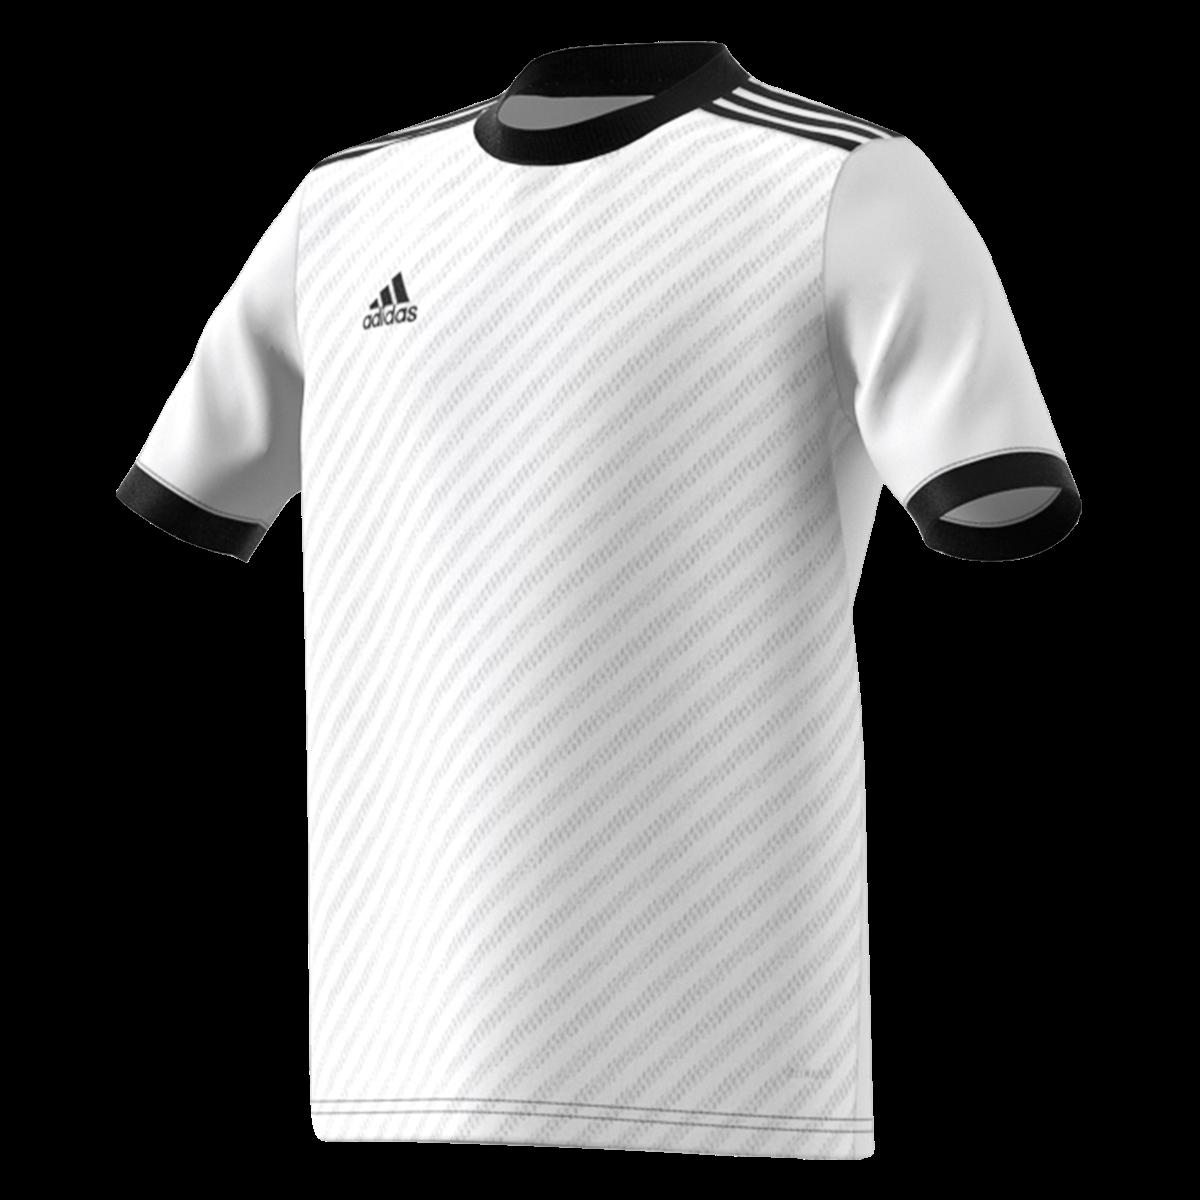 adidas Youth Tiro 19 Training Jersey-white/black-yxl | Adidas ...